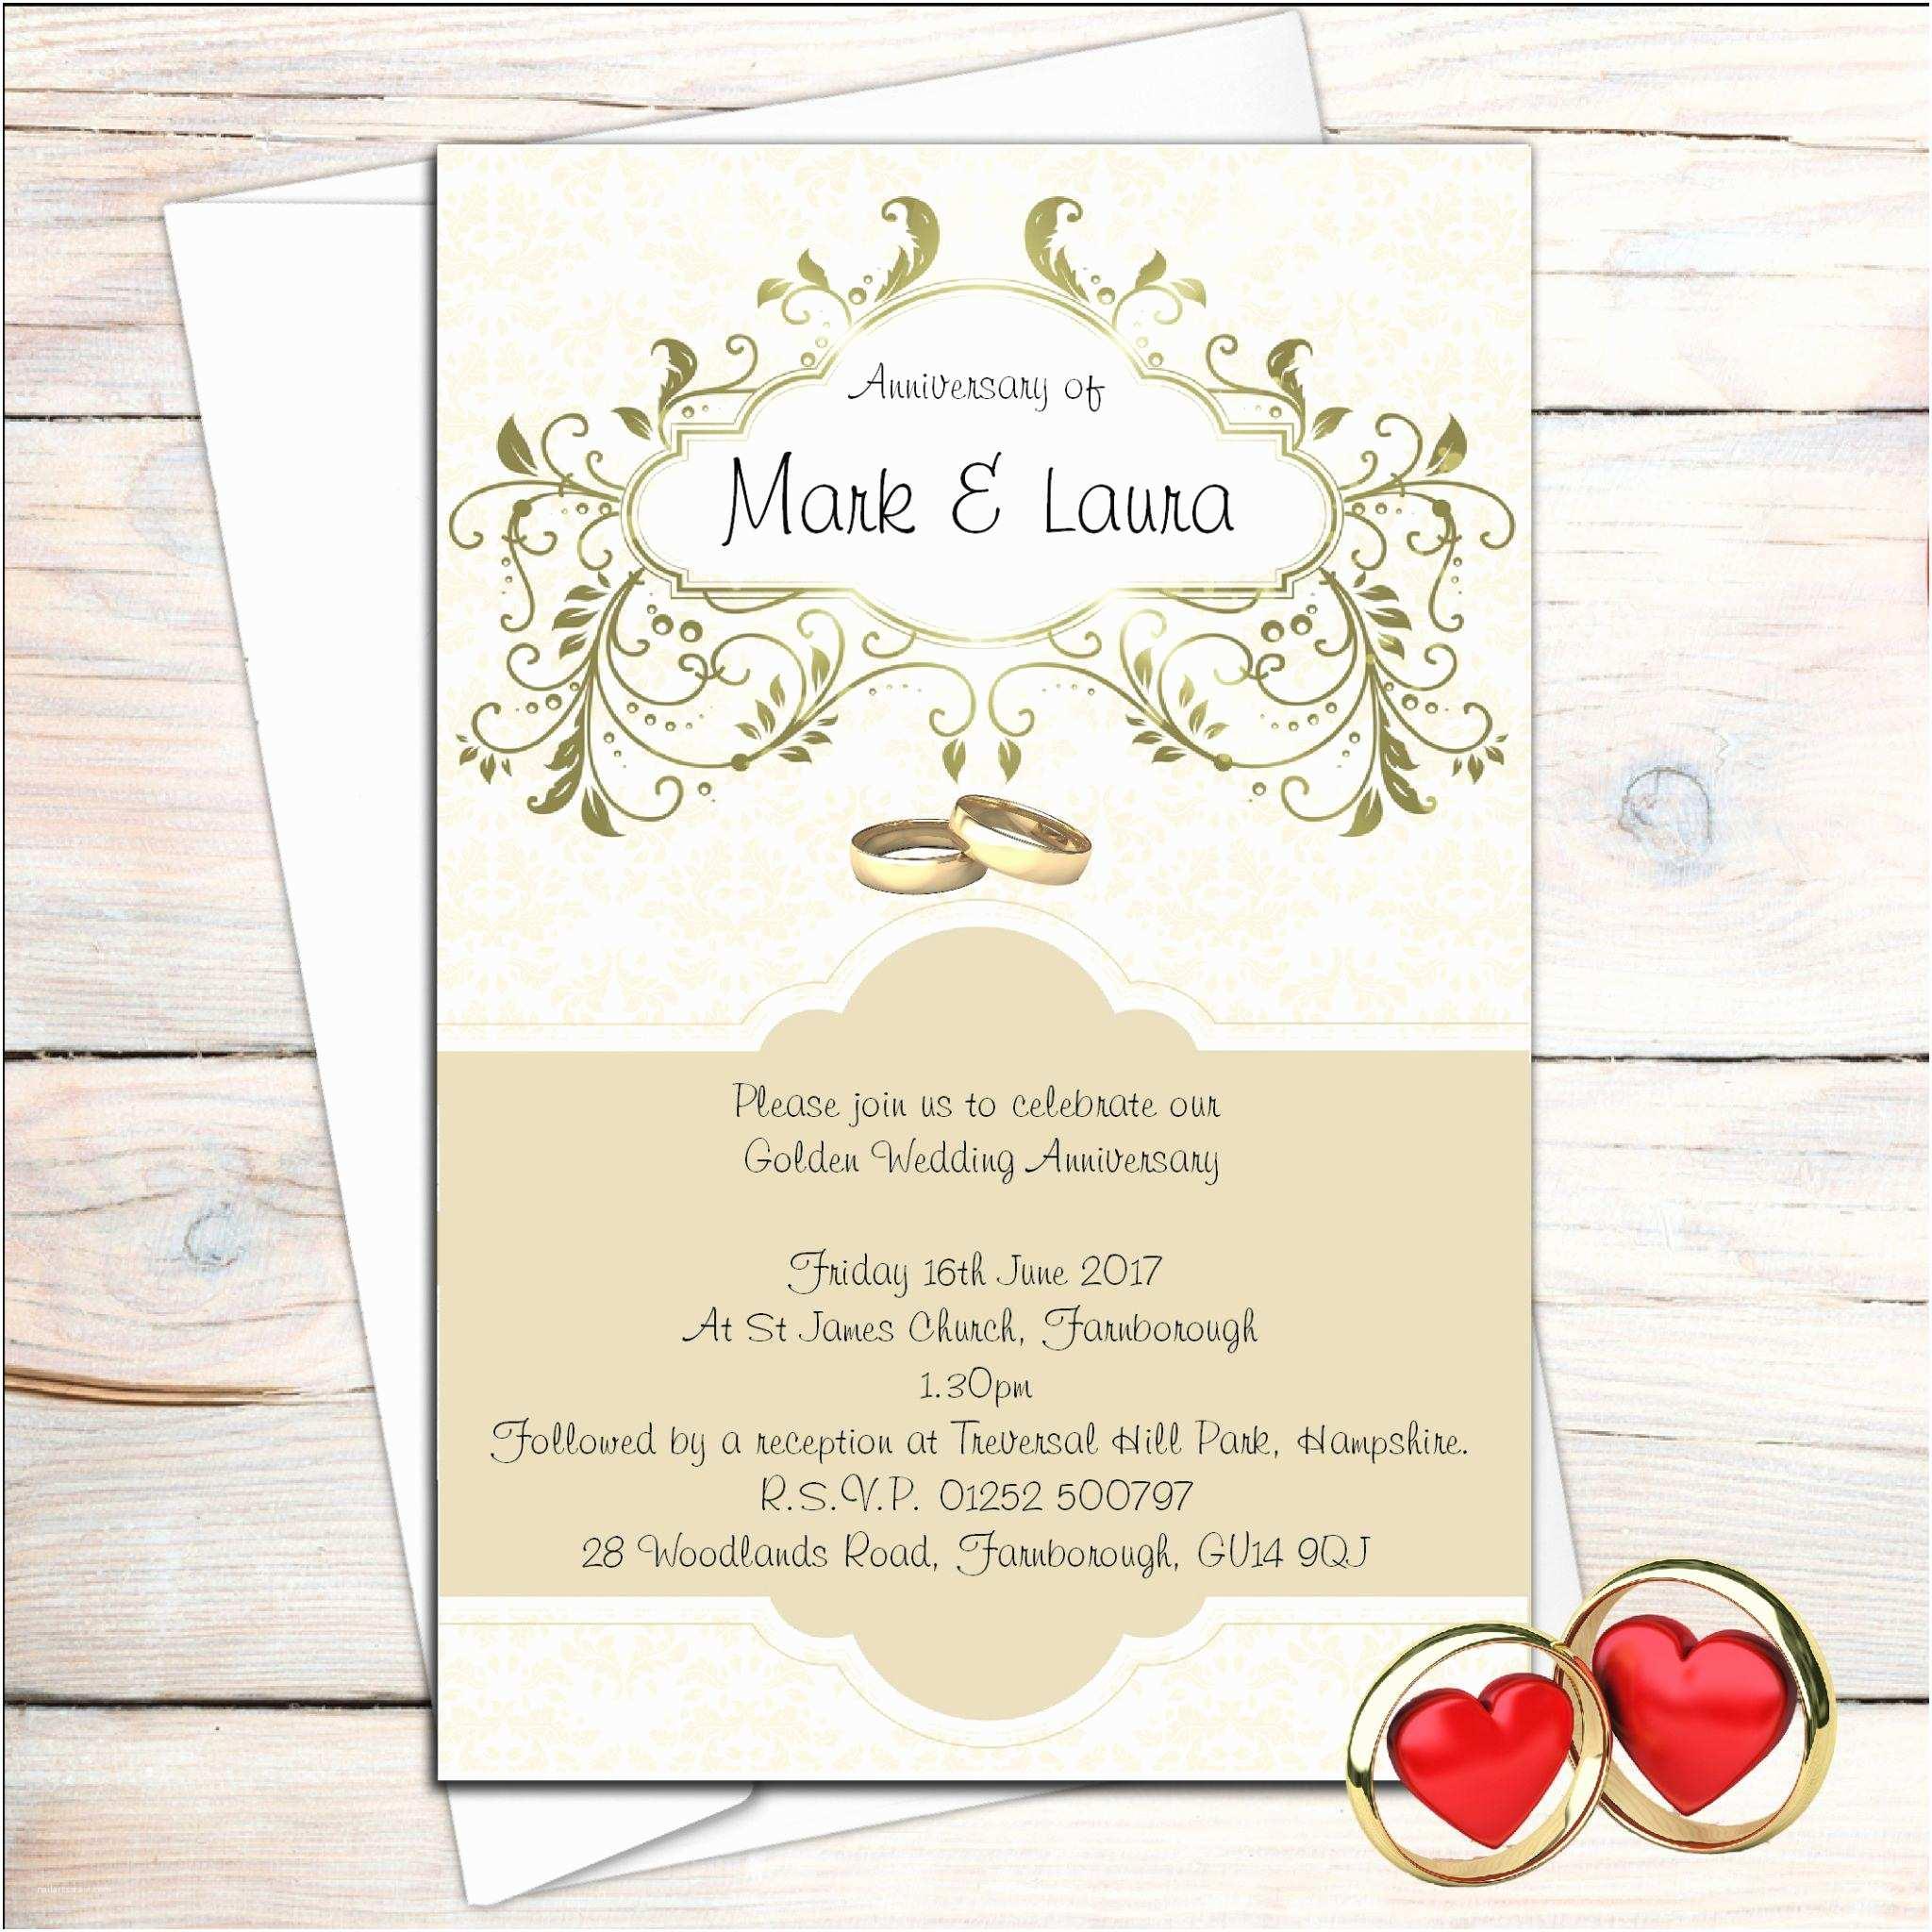 50th Wedding Invitation Templates Golden Wedding Anniversary Invitations 50th Wedding